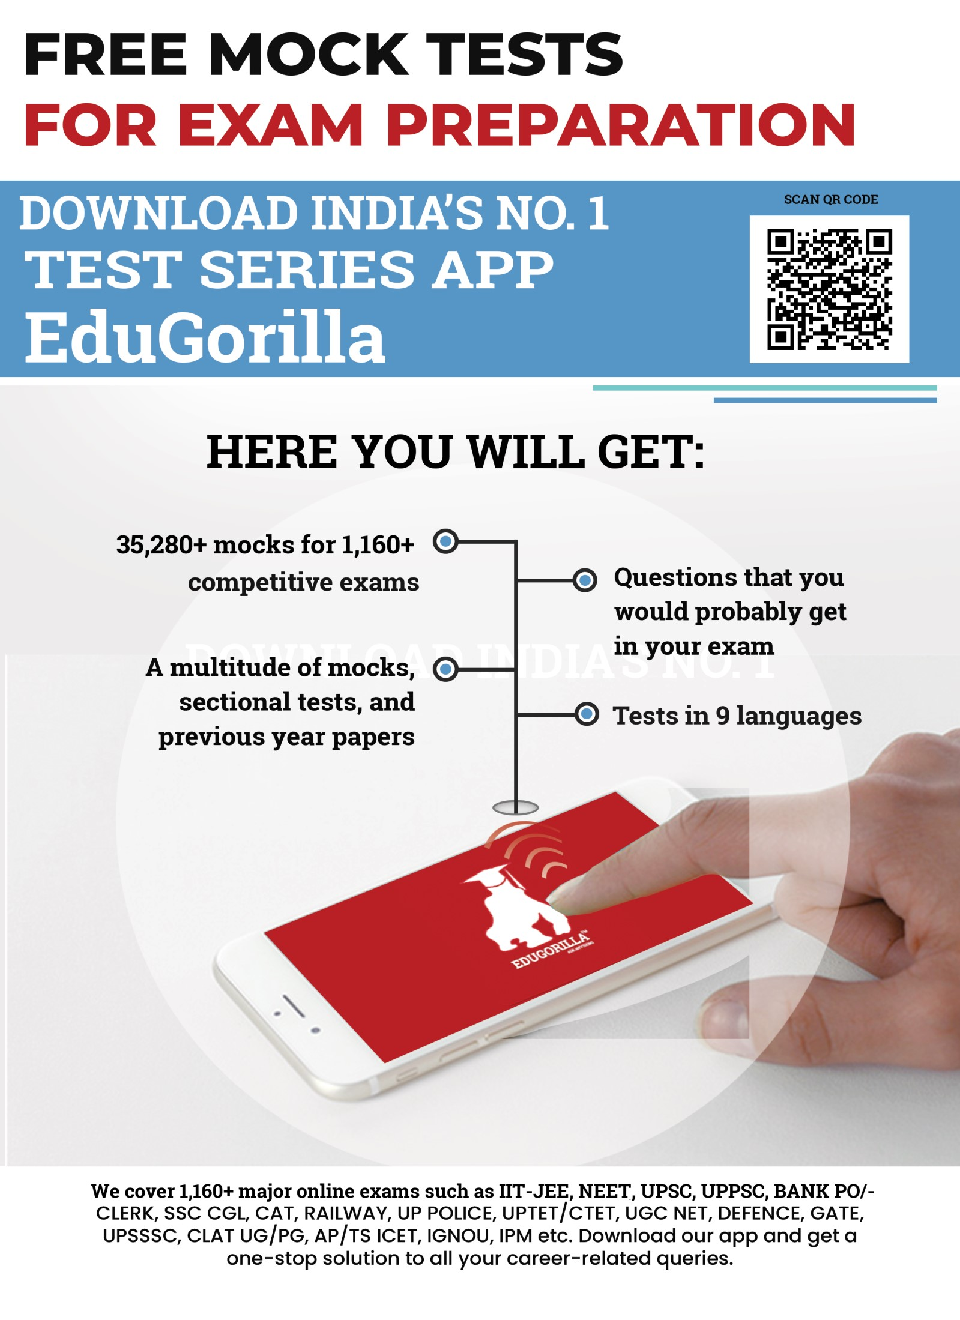 EduGorilla UGC NET : 2020 (Paper - 1) Latest Edition Practice Kit - Page 2